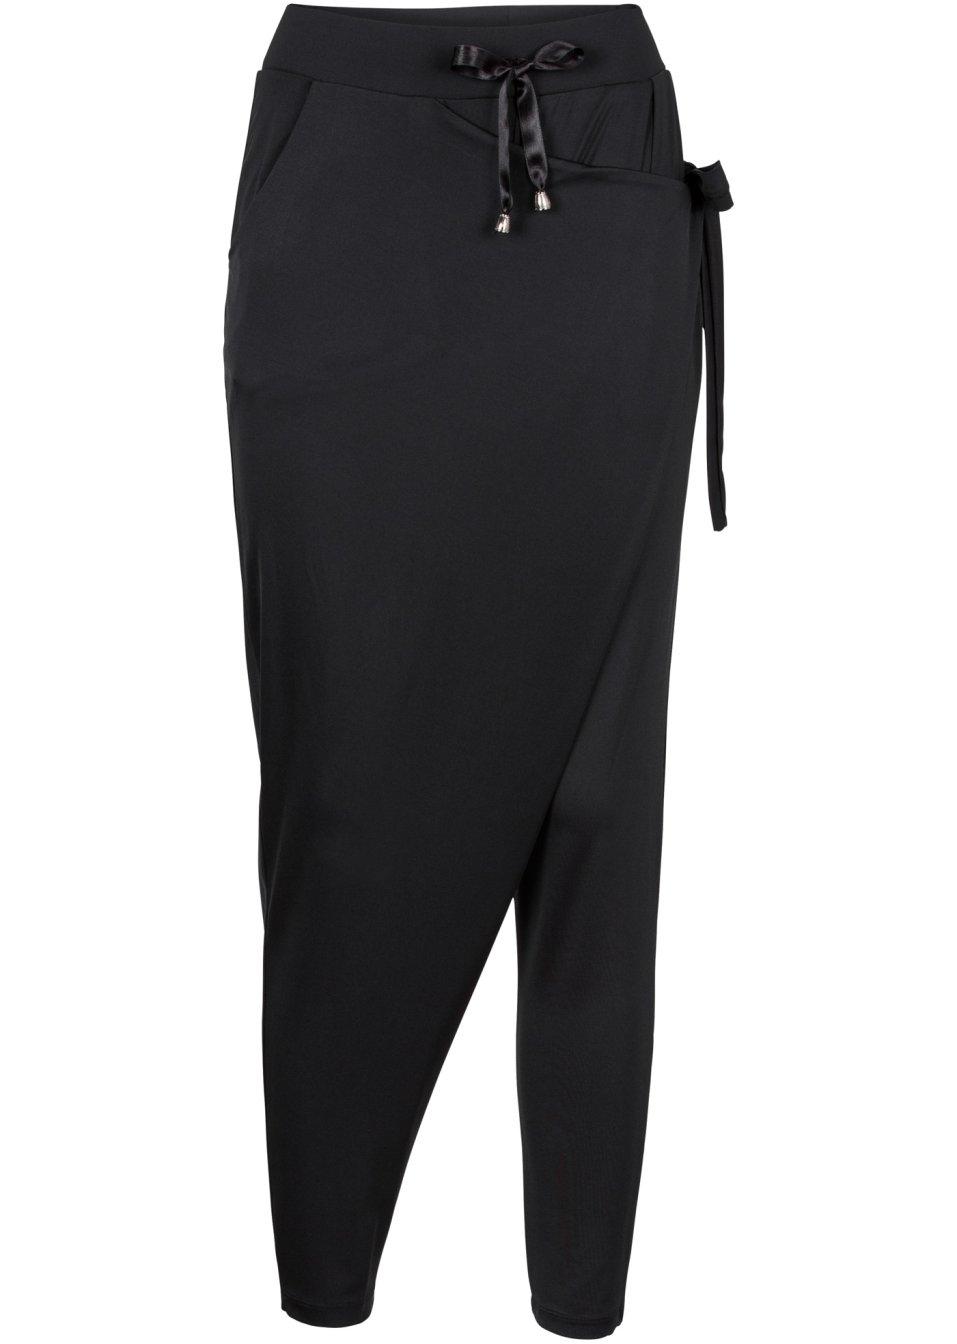 pantalon fluide noir femme rainbow. Black Bedroom Furniture Sets. Home Design Ideas